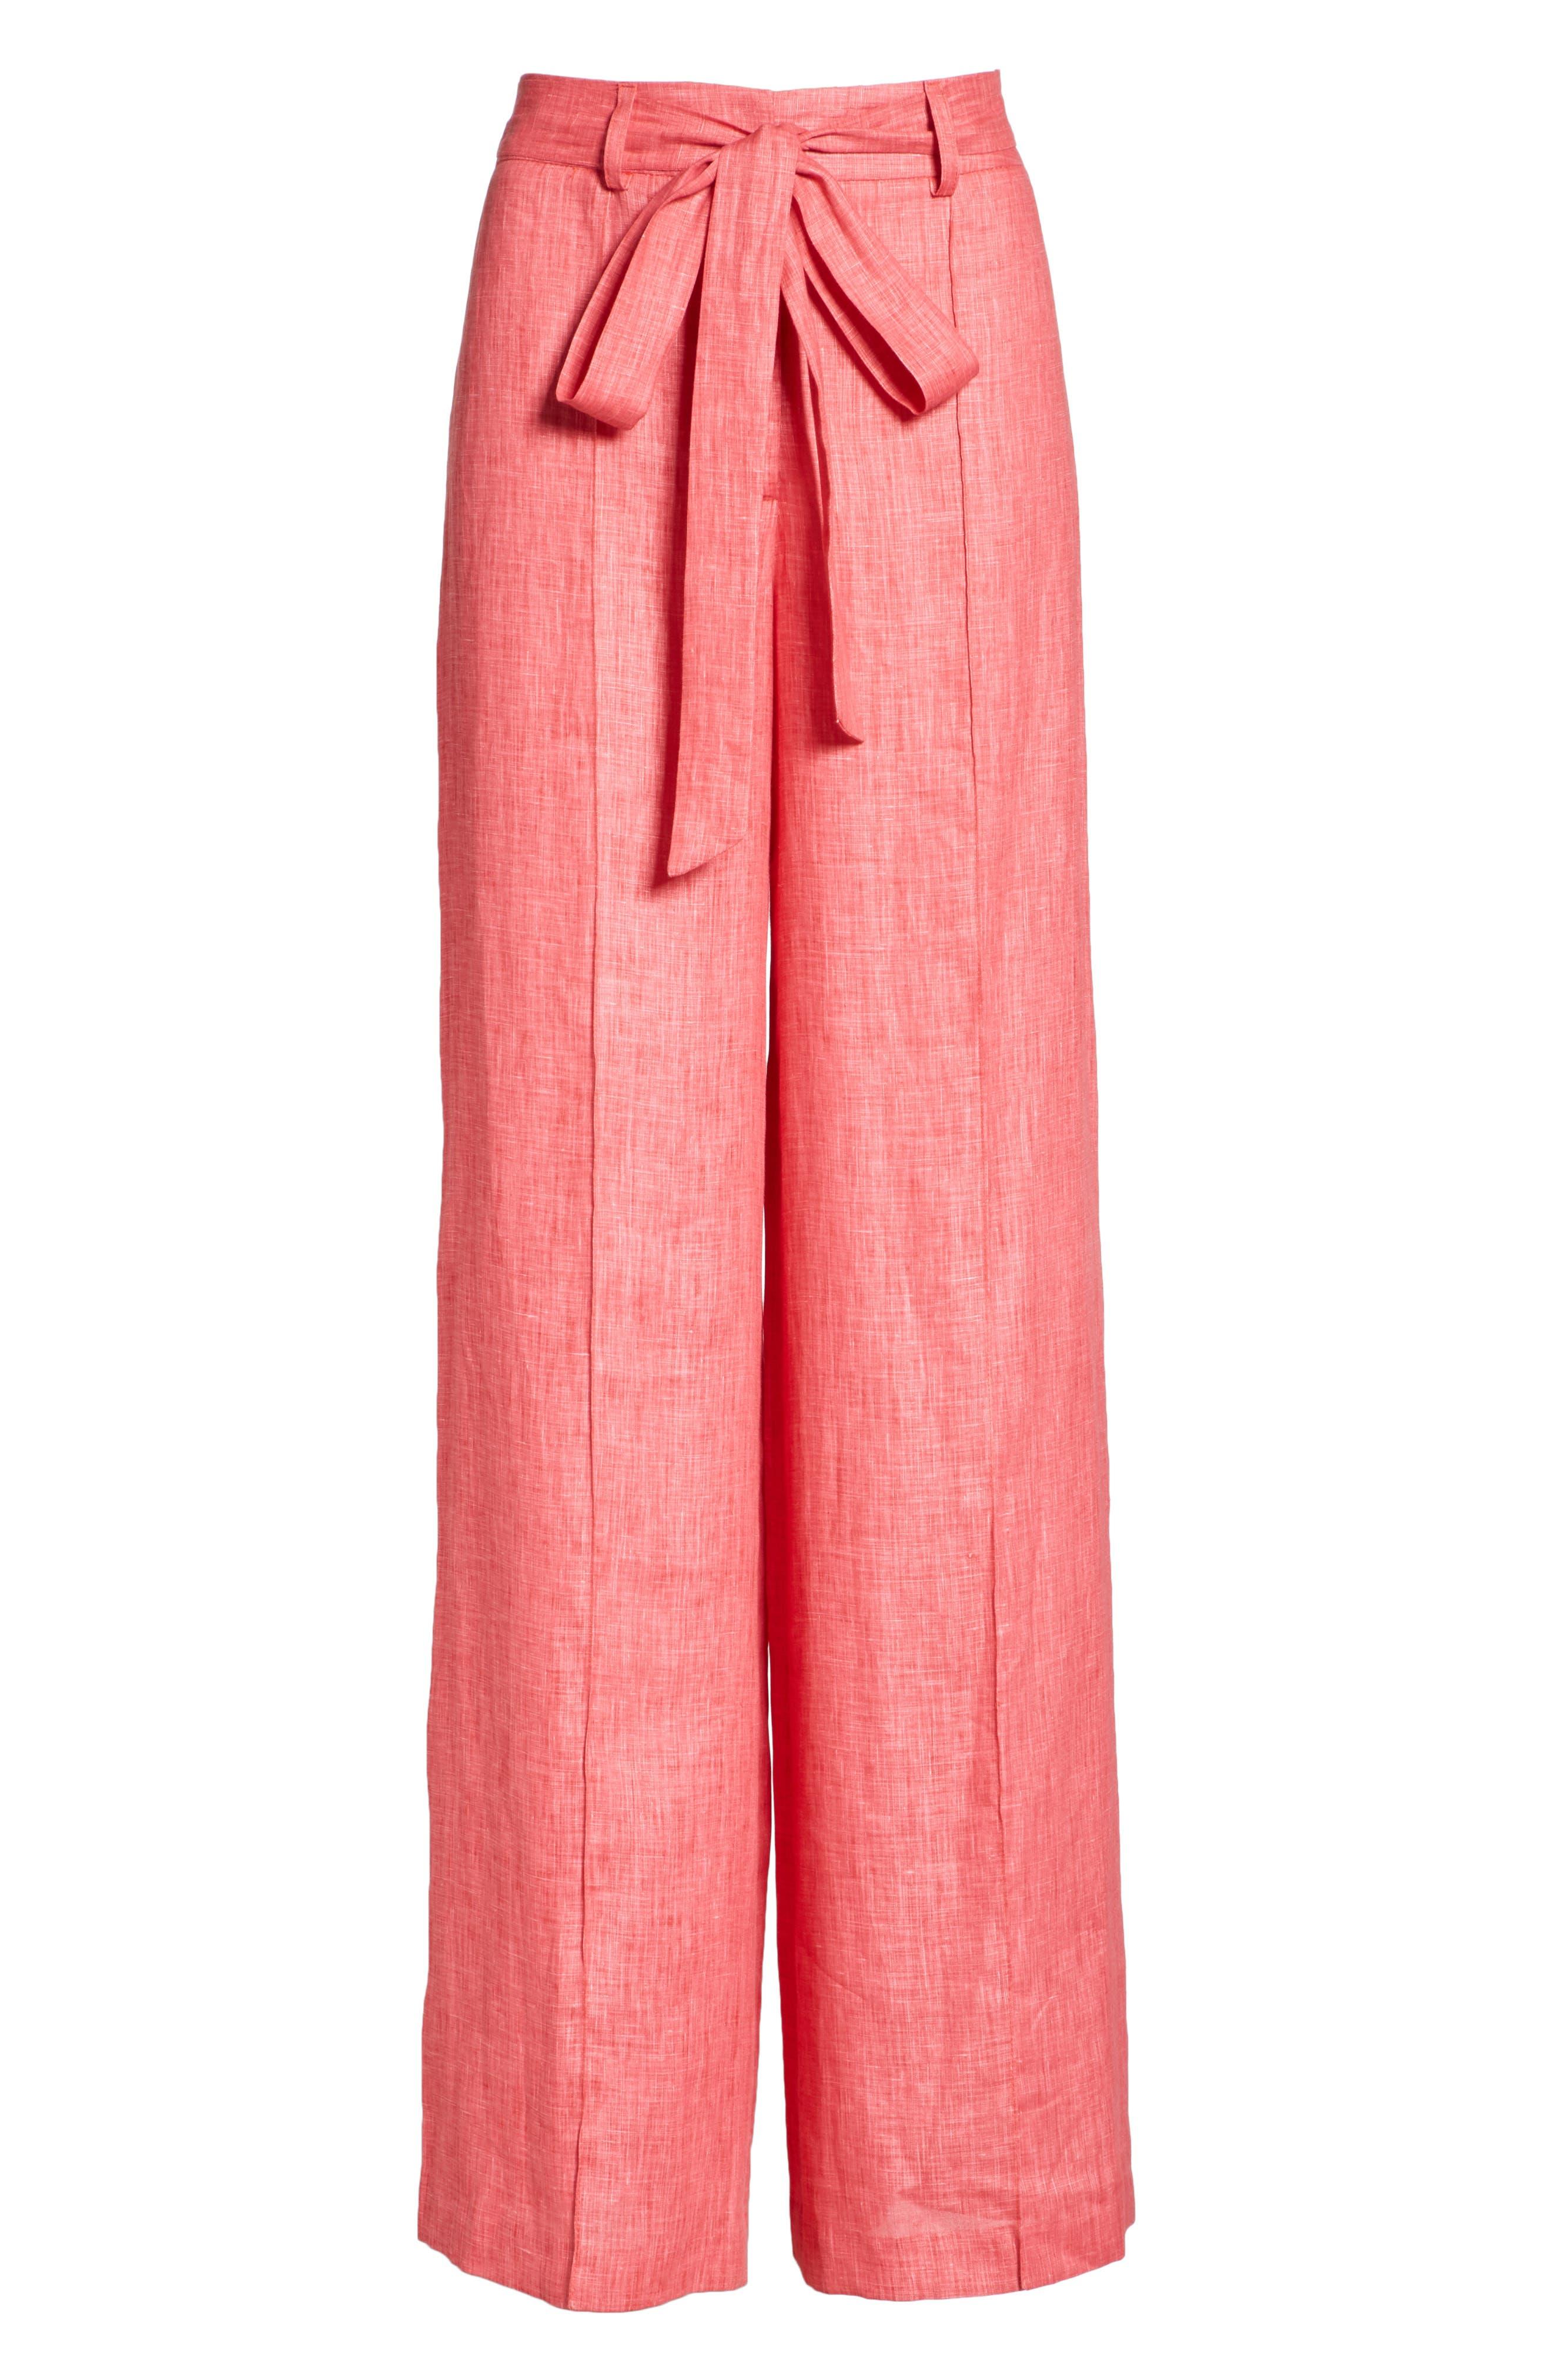 Hayden Belted Wide Leg Italian Linen Pants,                             Alternate thumbnail 6, color,                             Poppy